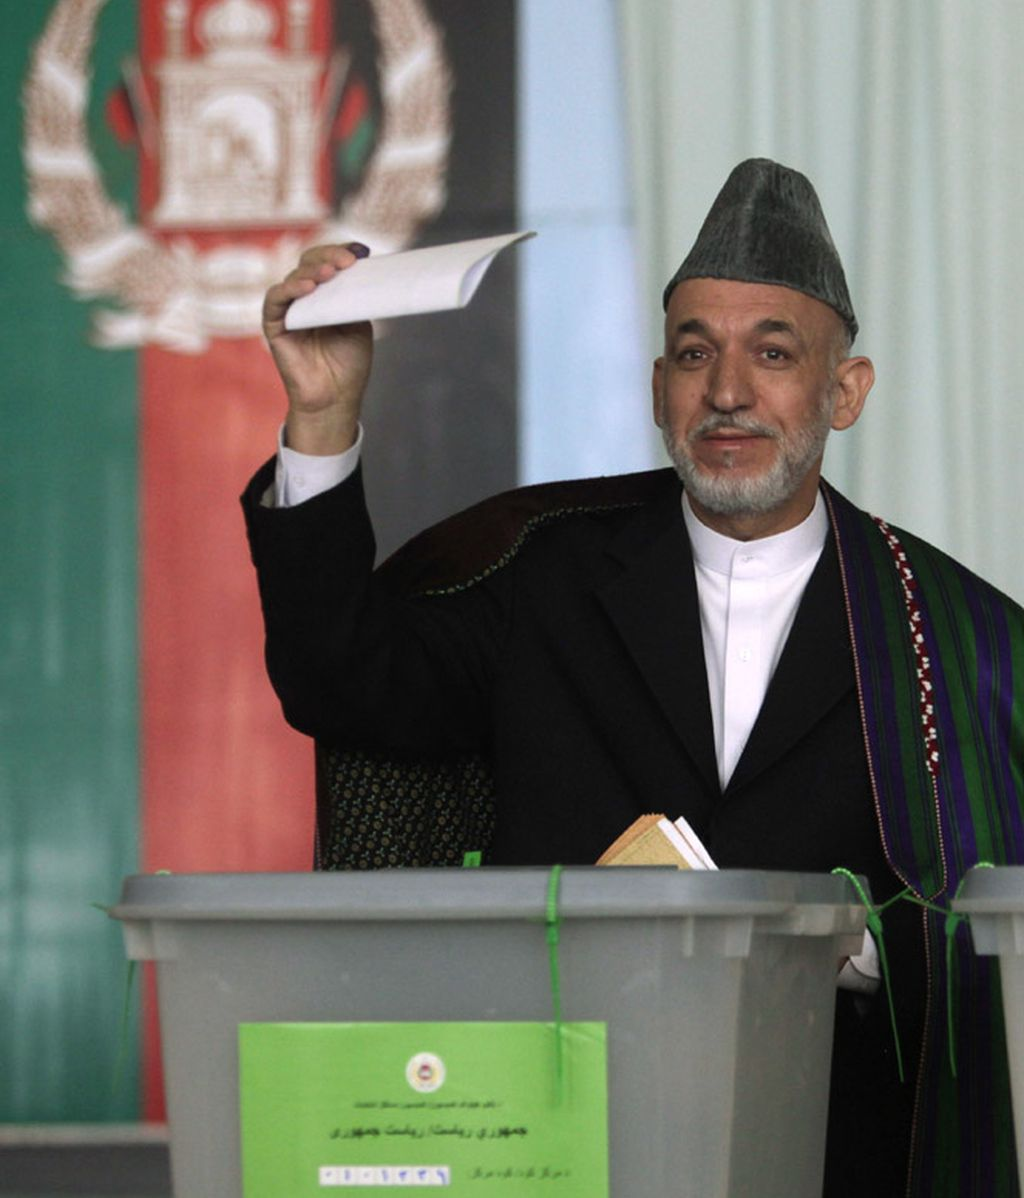 Hamid Karzai votando